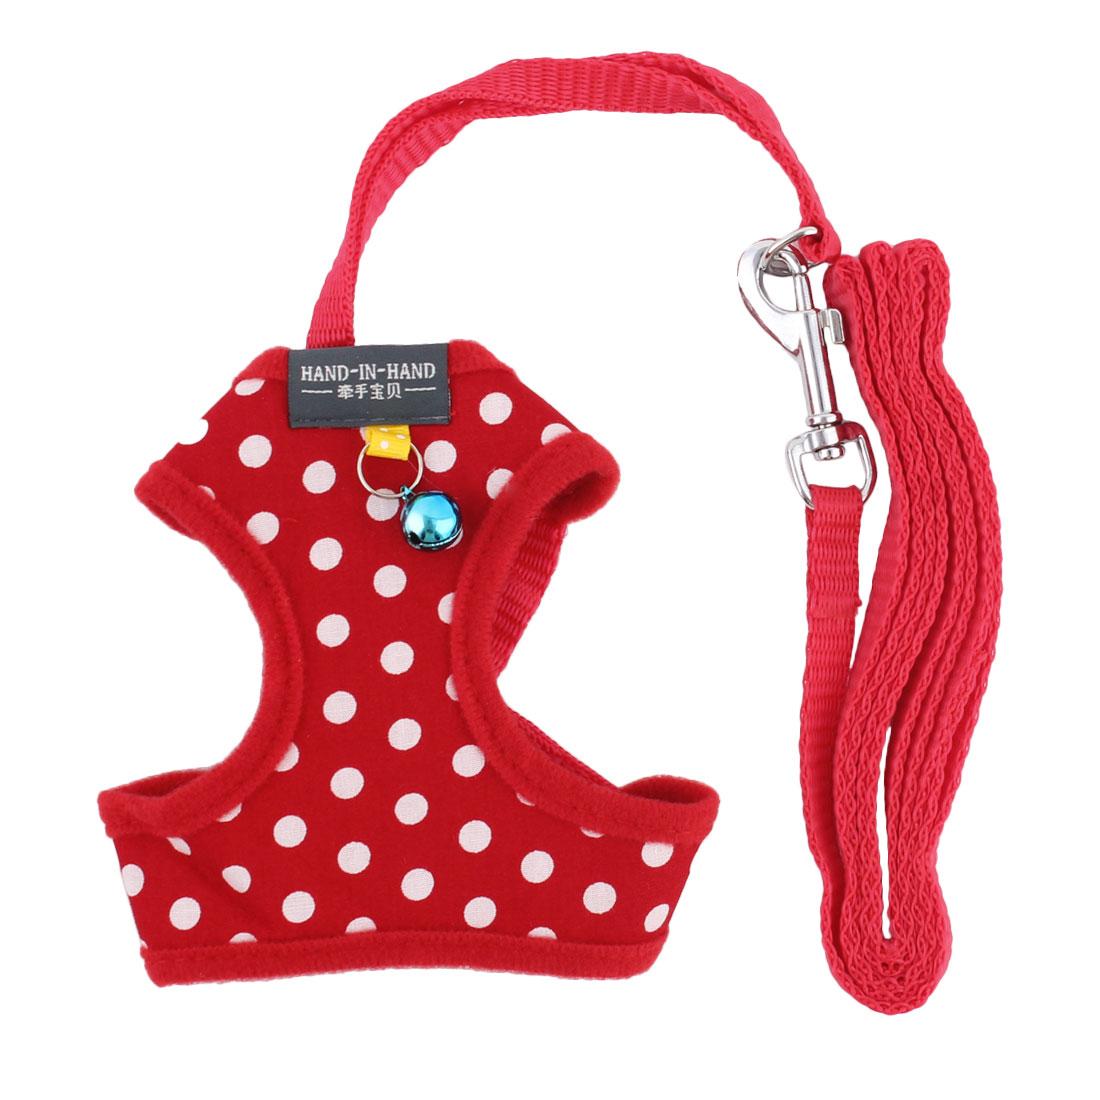 Dog Dress Wave Point Partten Bell Decor Breathable Harness Vest Leash Red Size S